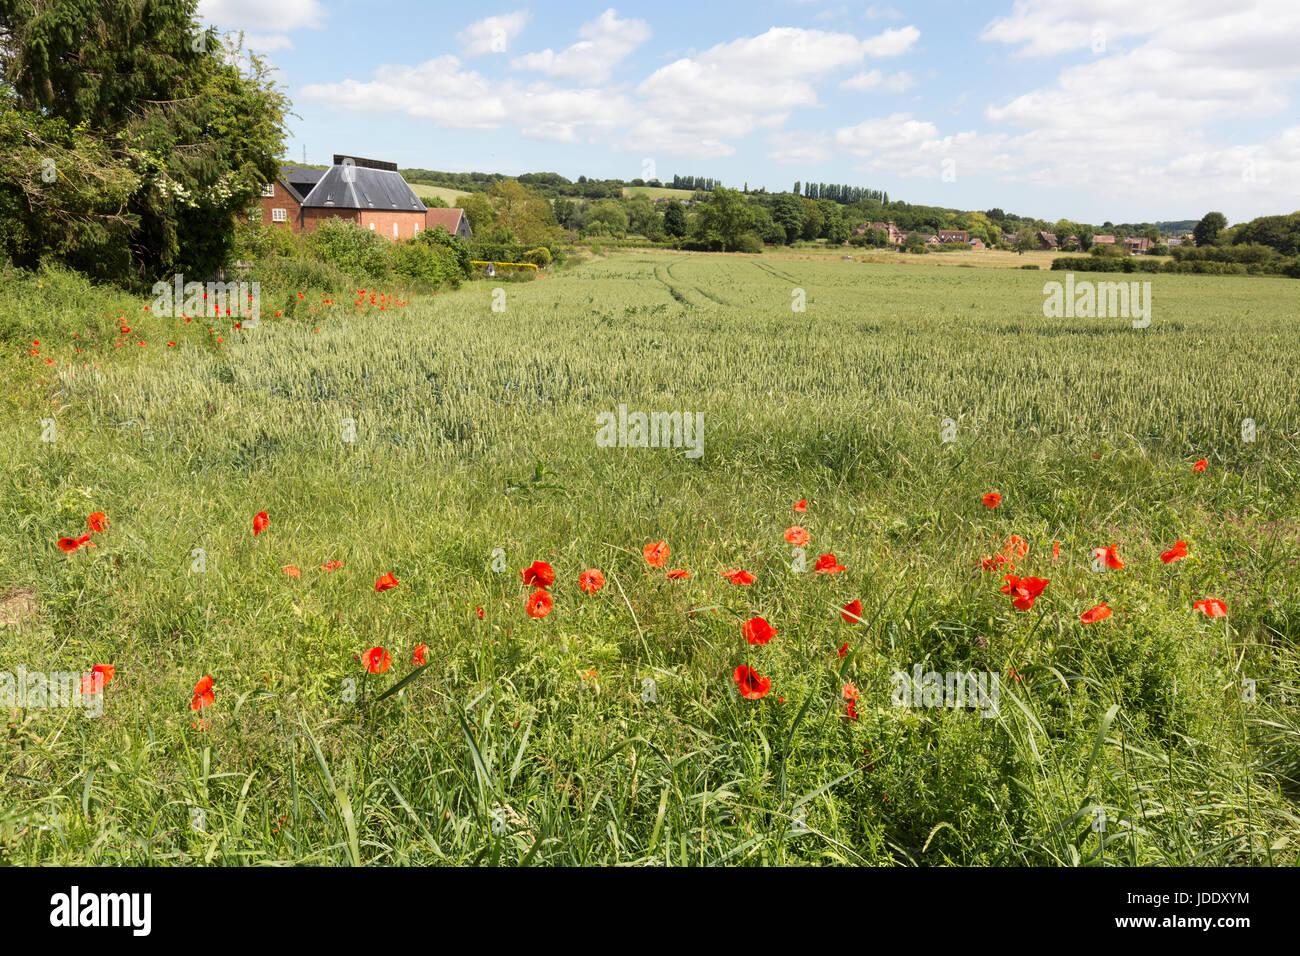 Campagna britannica in estate - Stour Valley paesaggi, papaveri in un campo in Chartham, Stour Valley, Kent England Immagini Stock